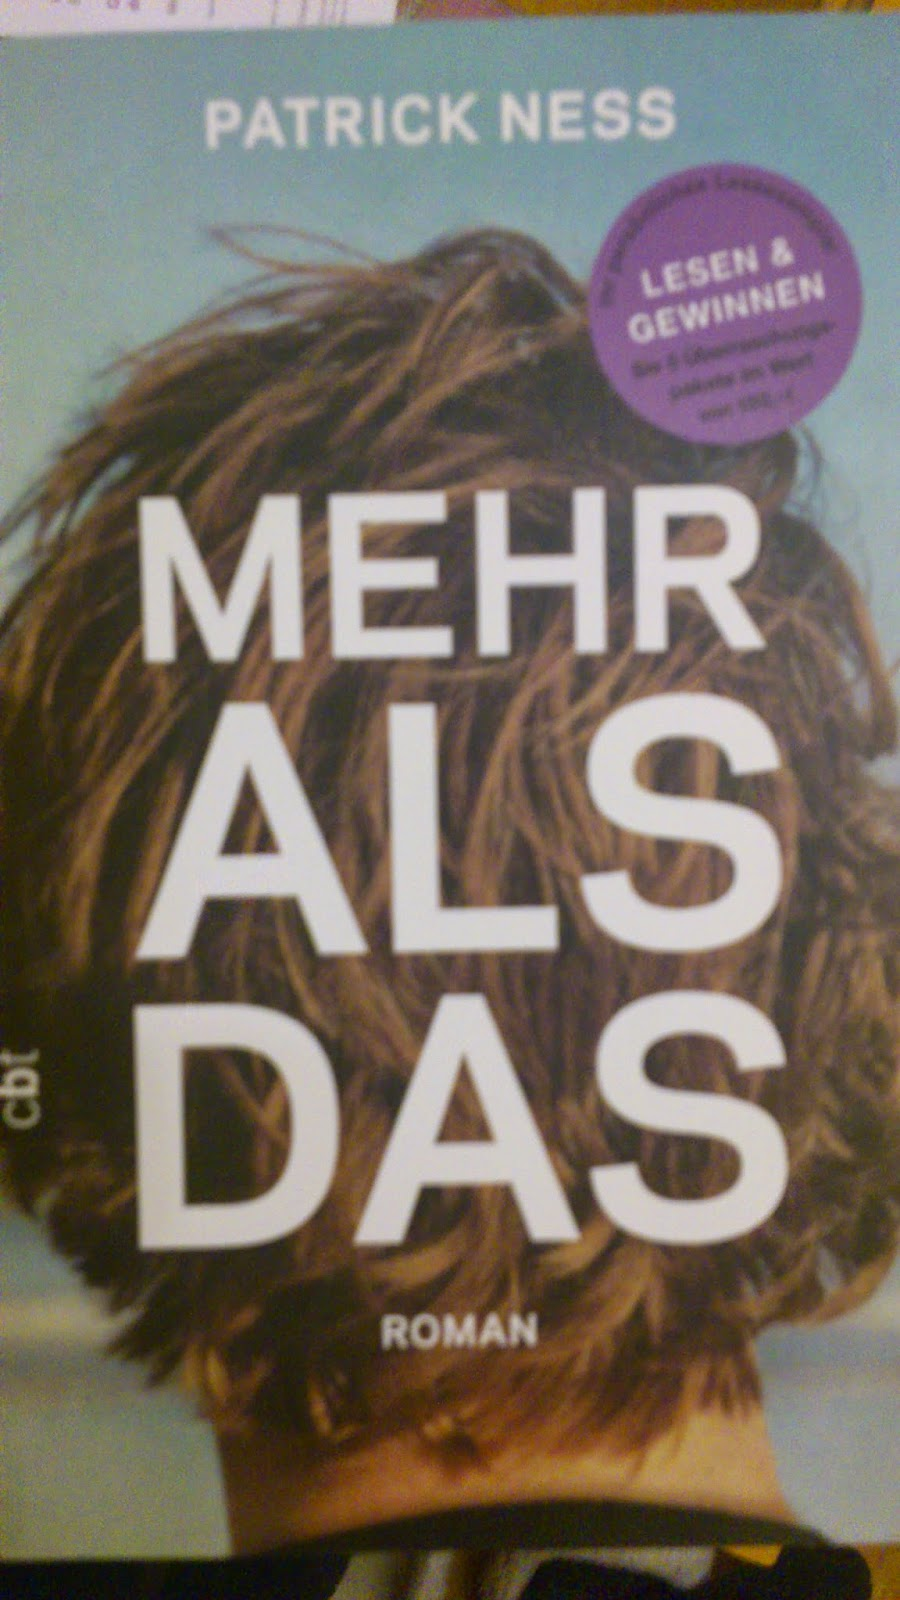 http://www.lenasbuecherwelt.blogspot.de/2014/03/rezension-patrick-ness-mehr-als-das.html